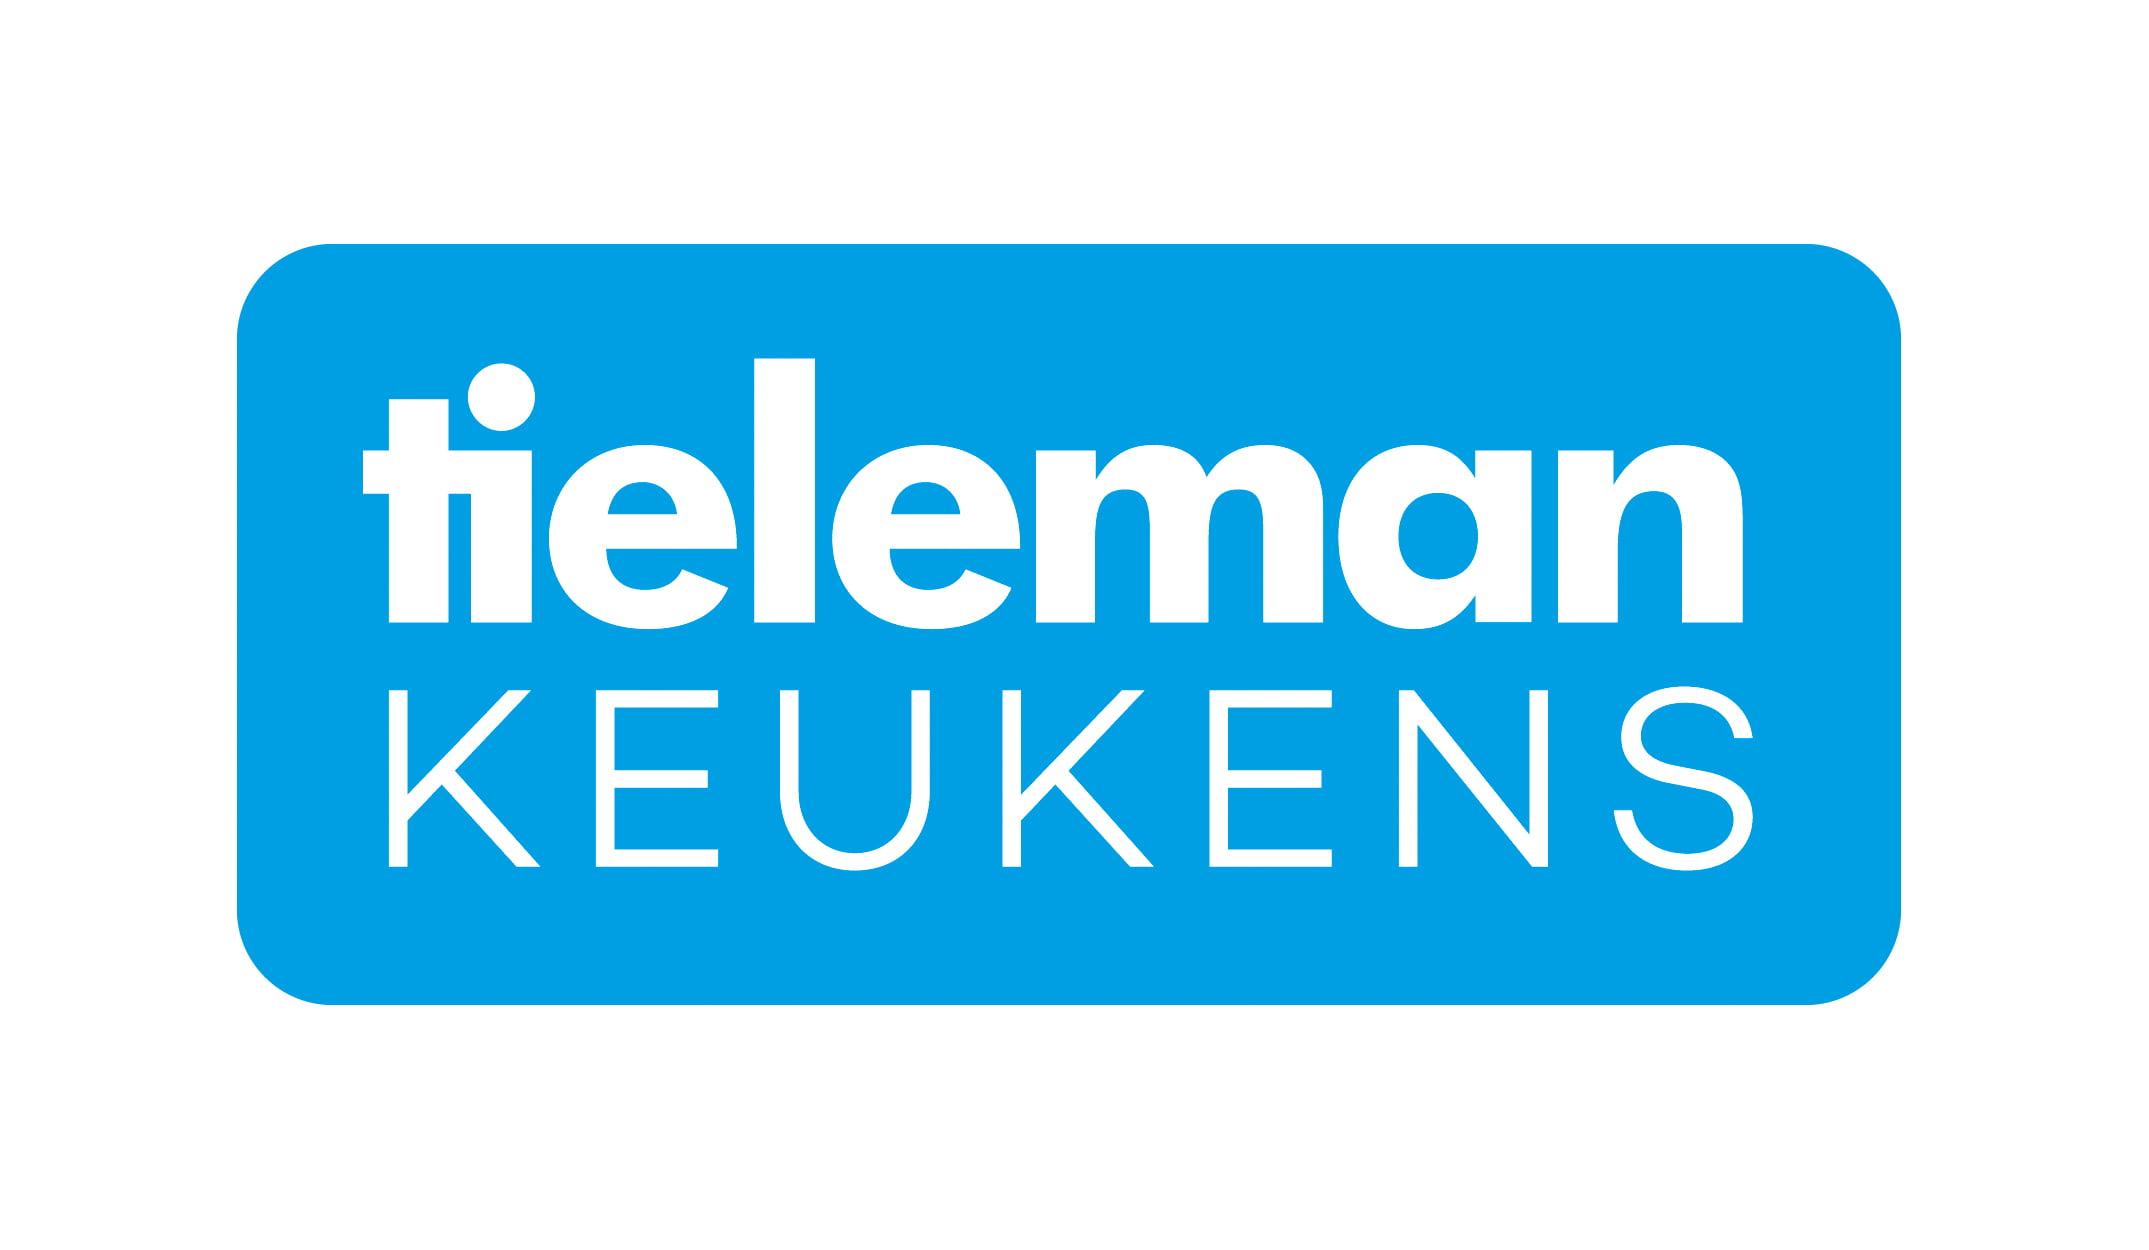 Tieleman Keukens logo